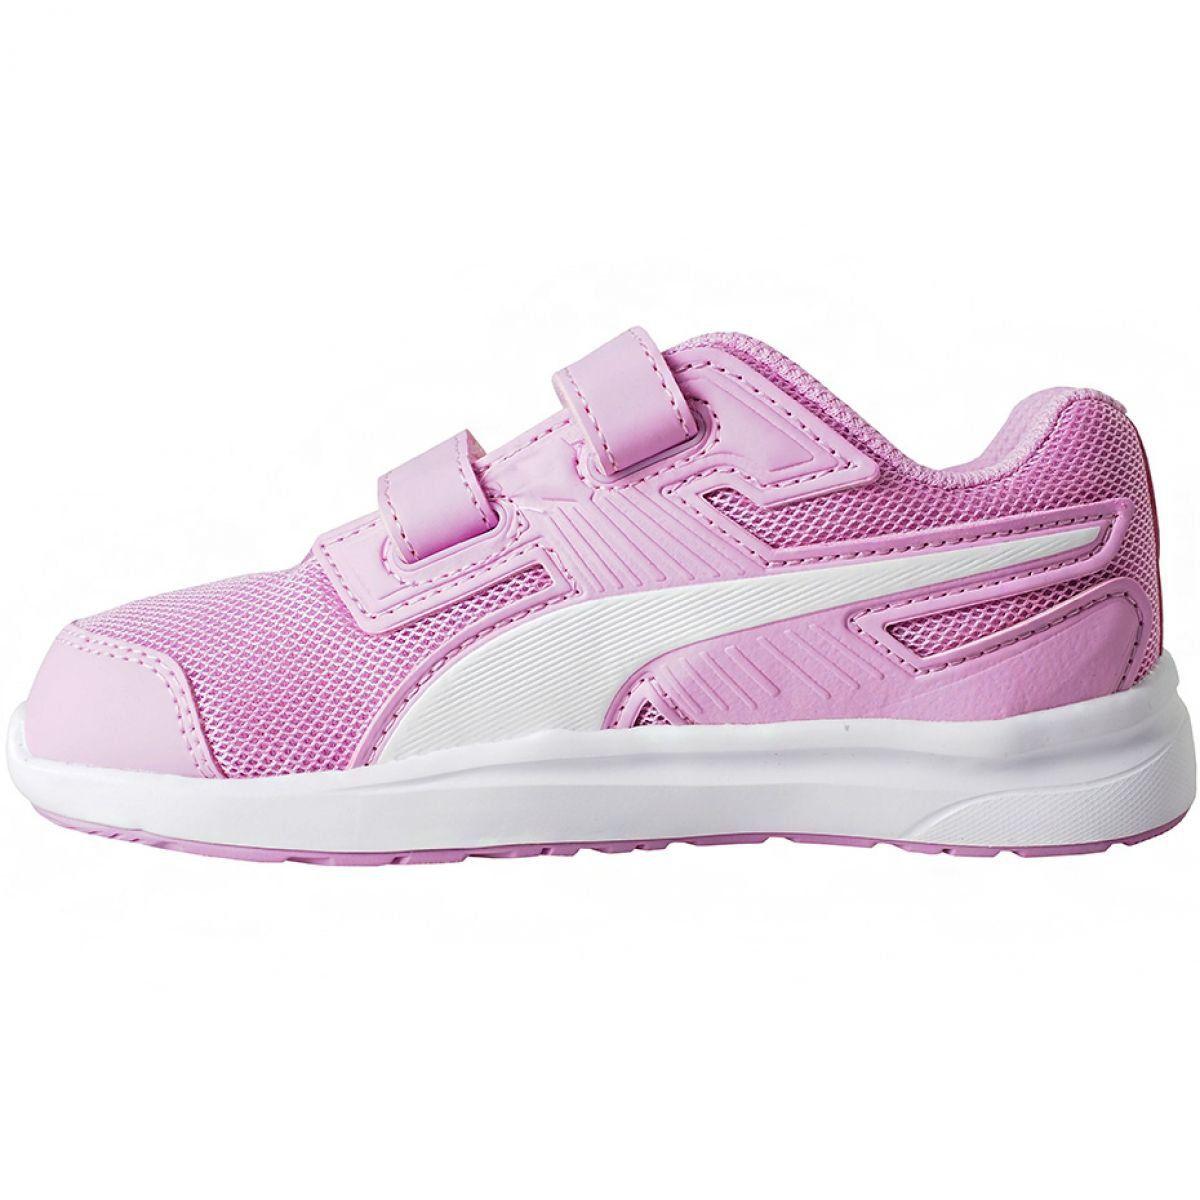 Buty Puma Escaper Mesh V Inf Jr 190327 09 Rozowe Childrens Shoes Kid Shoes On Shoes